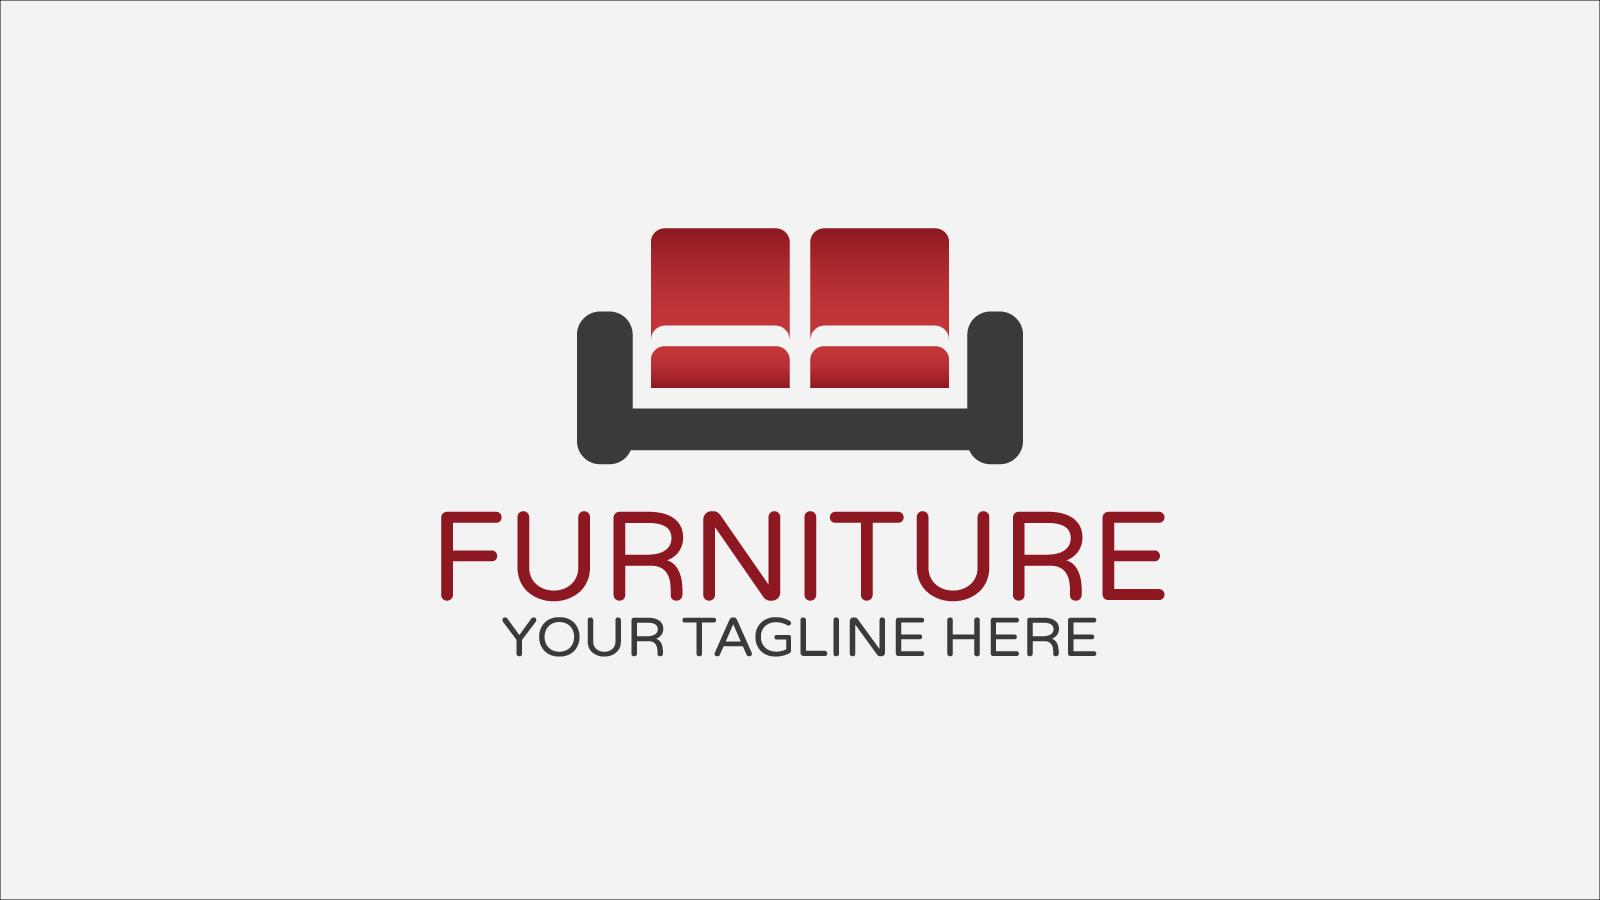 Furniture free logo design zfreegraphic free vector logo downloads furniture free business logo design template interior cheaphphosting Choice Image